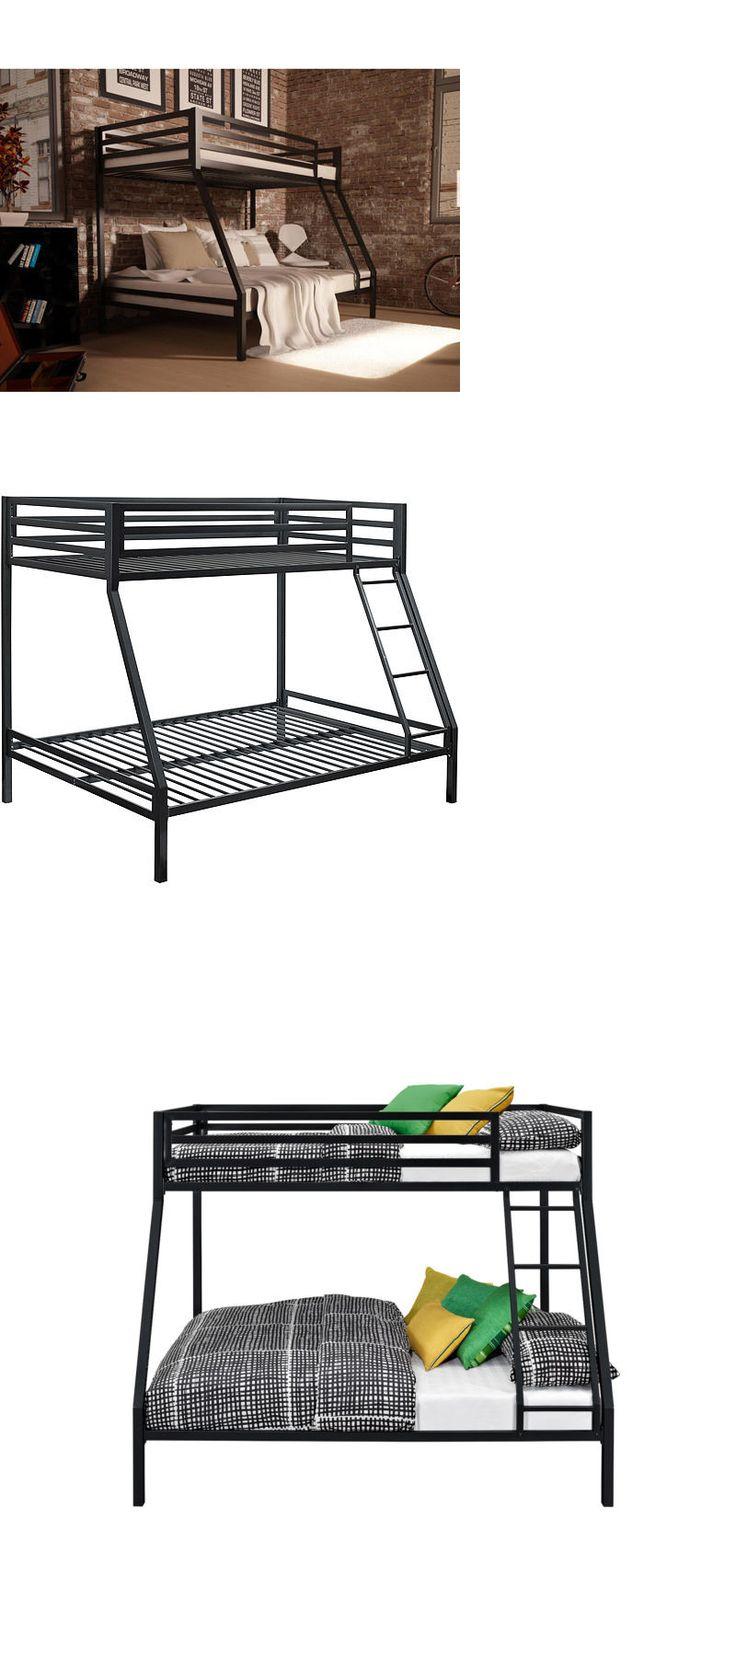 Kids Furniture: Twin Over Full Bunk Bed Black Metal Ladder Kids Bedroom Furniture Beds Frame BUY IT NOW ONLY: $220.66